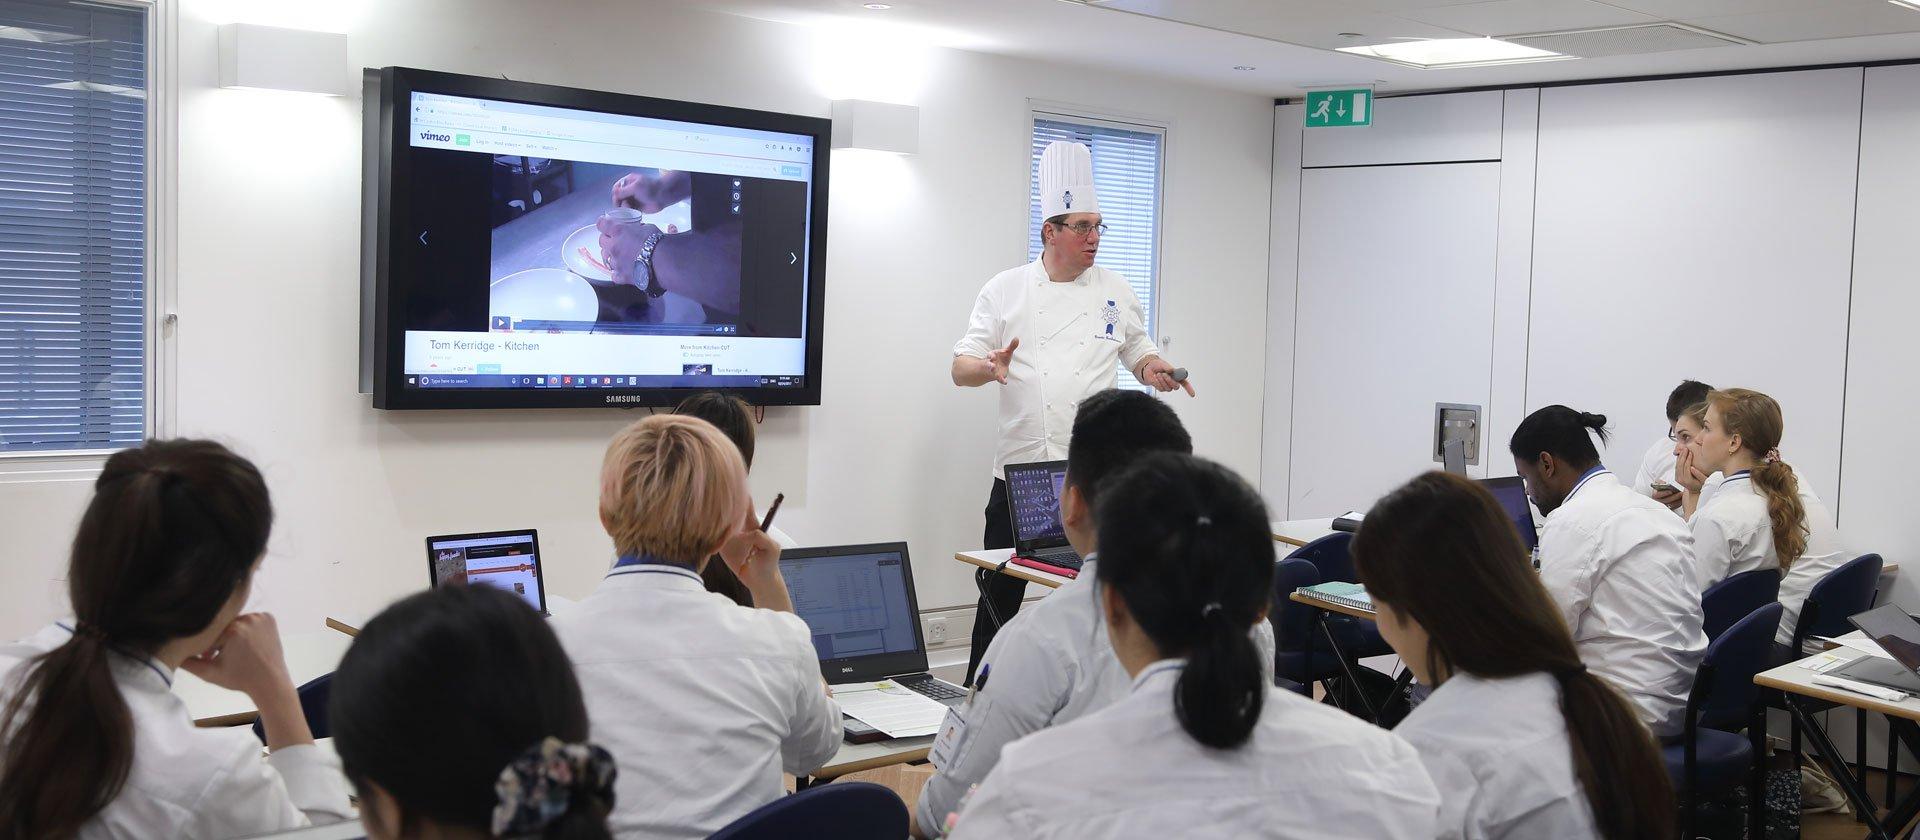 Pastry Chef Graeme Bartholomew - Le Cordon Bleu London